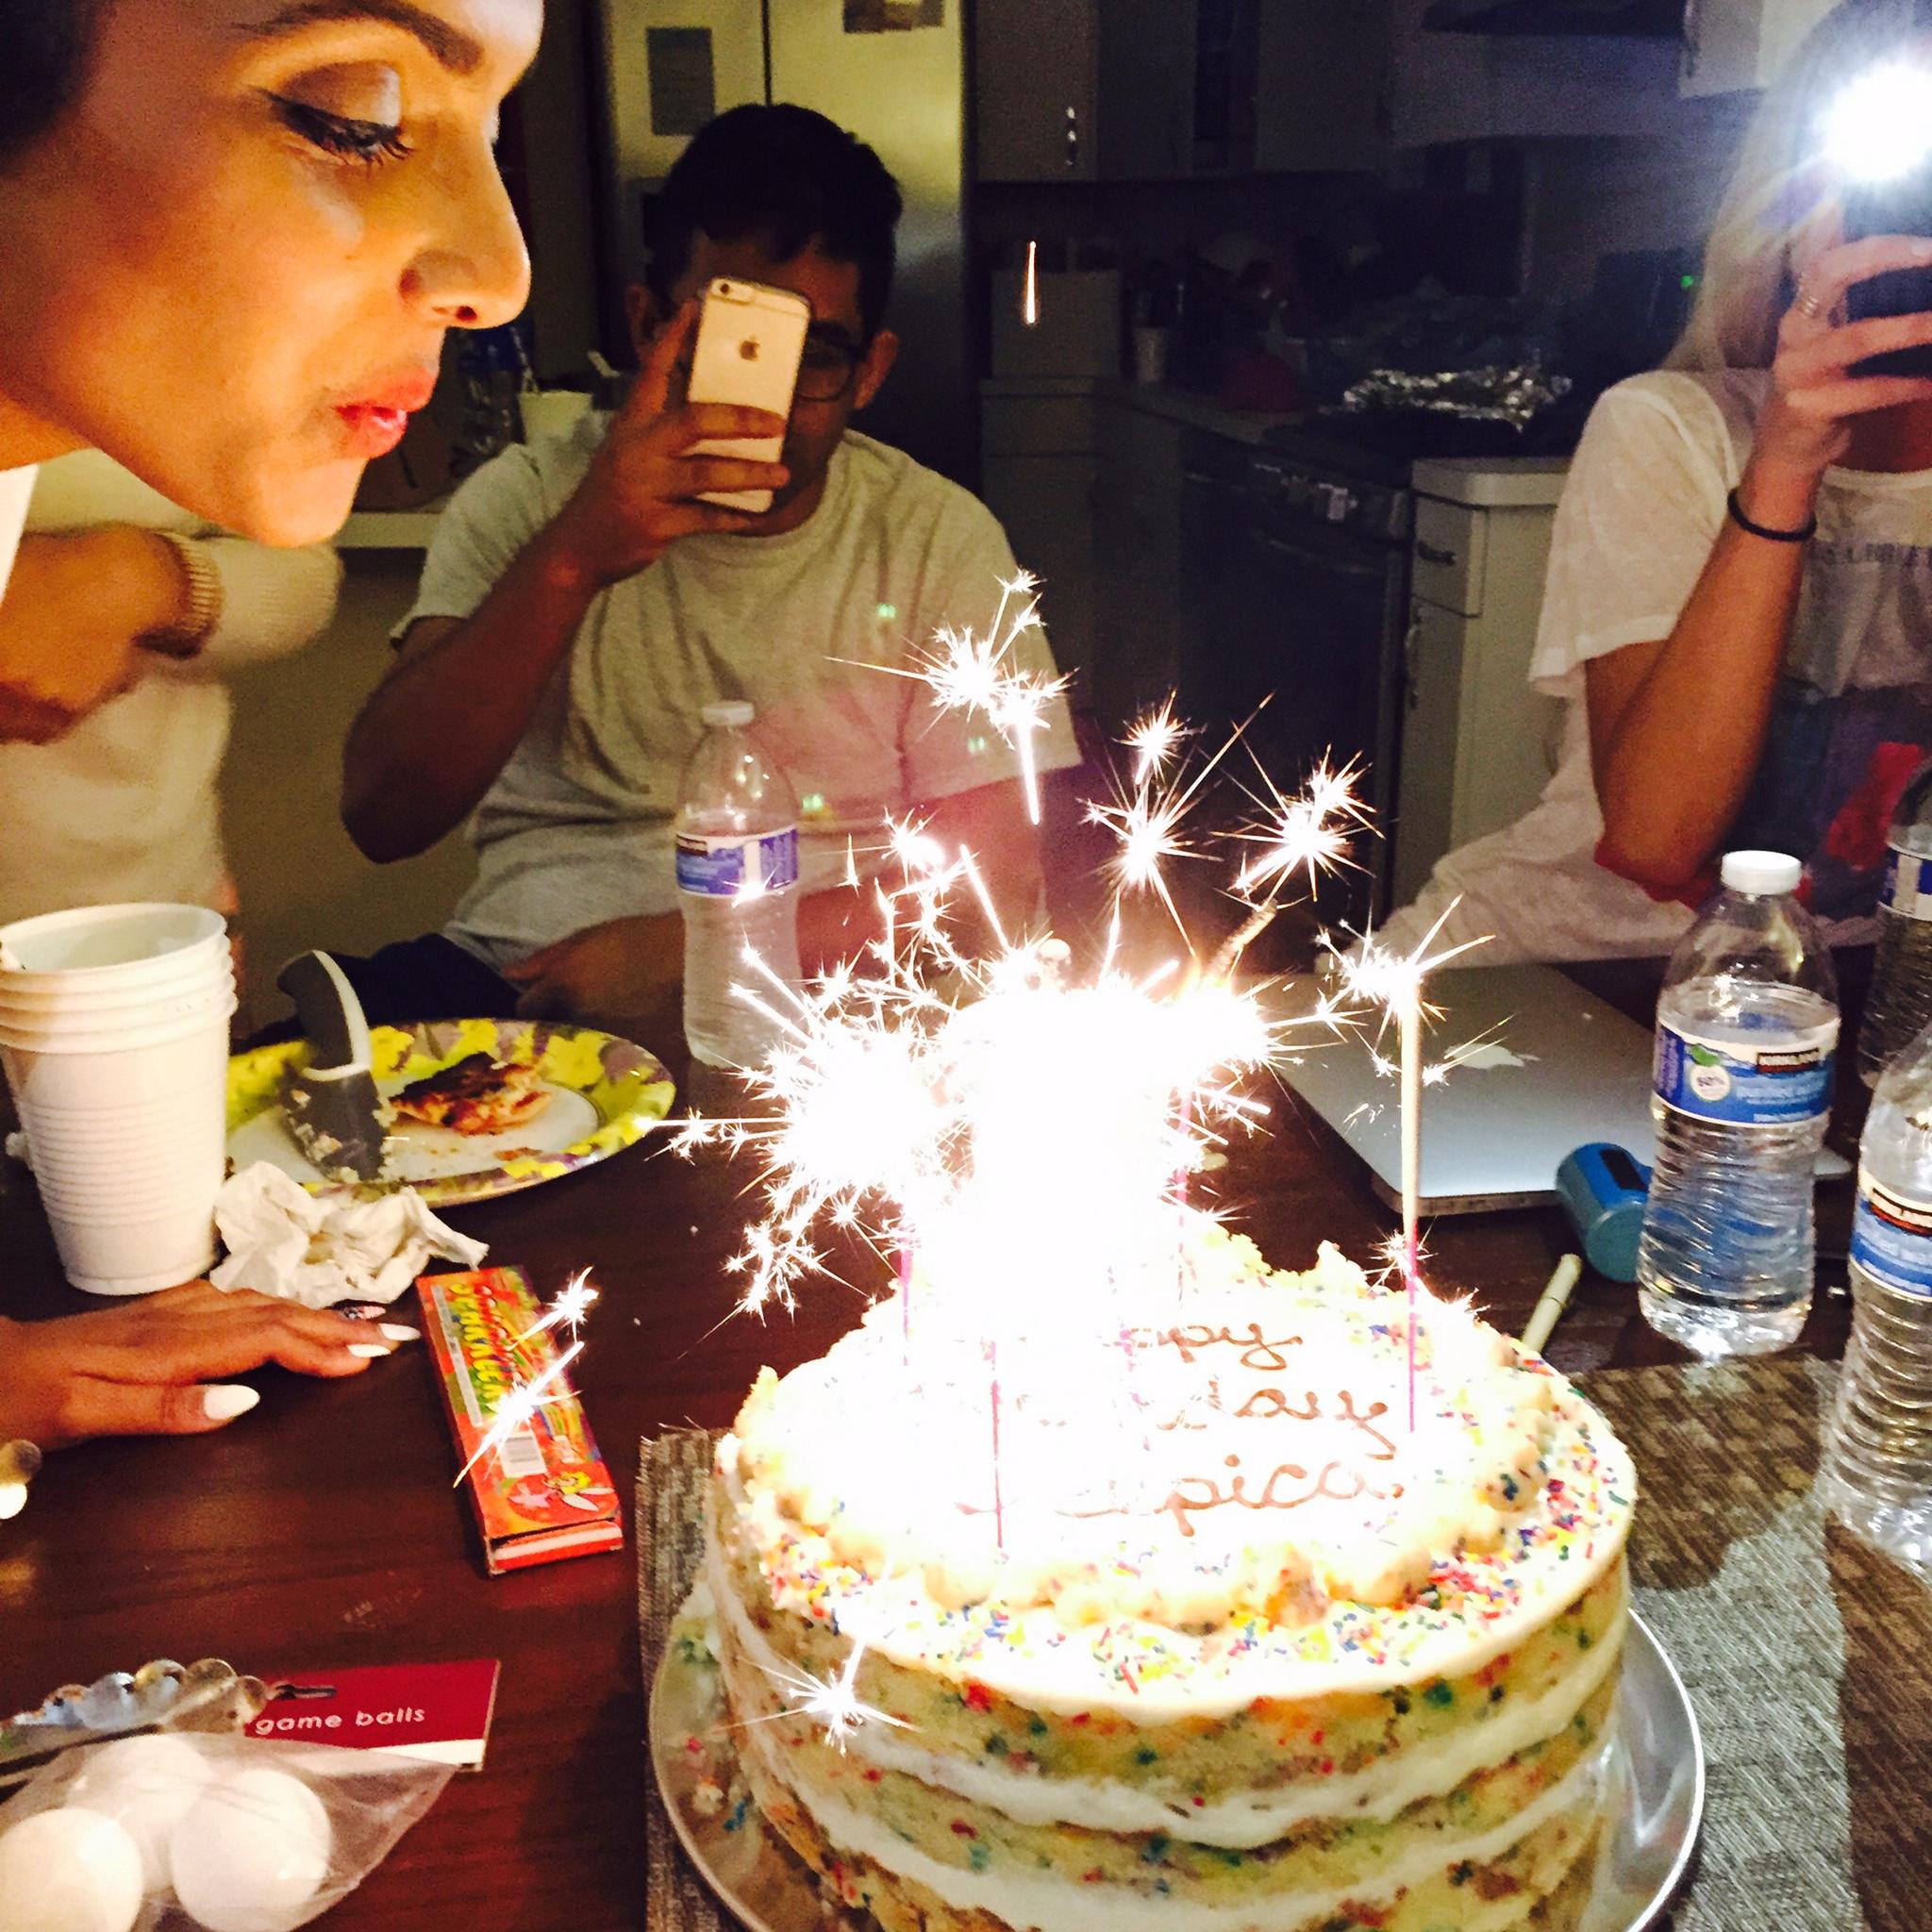 Midnight cake cutting sesh